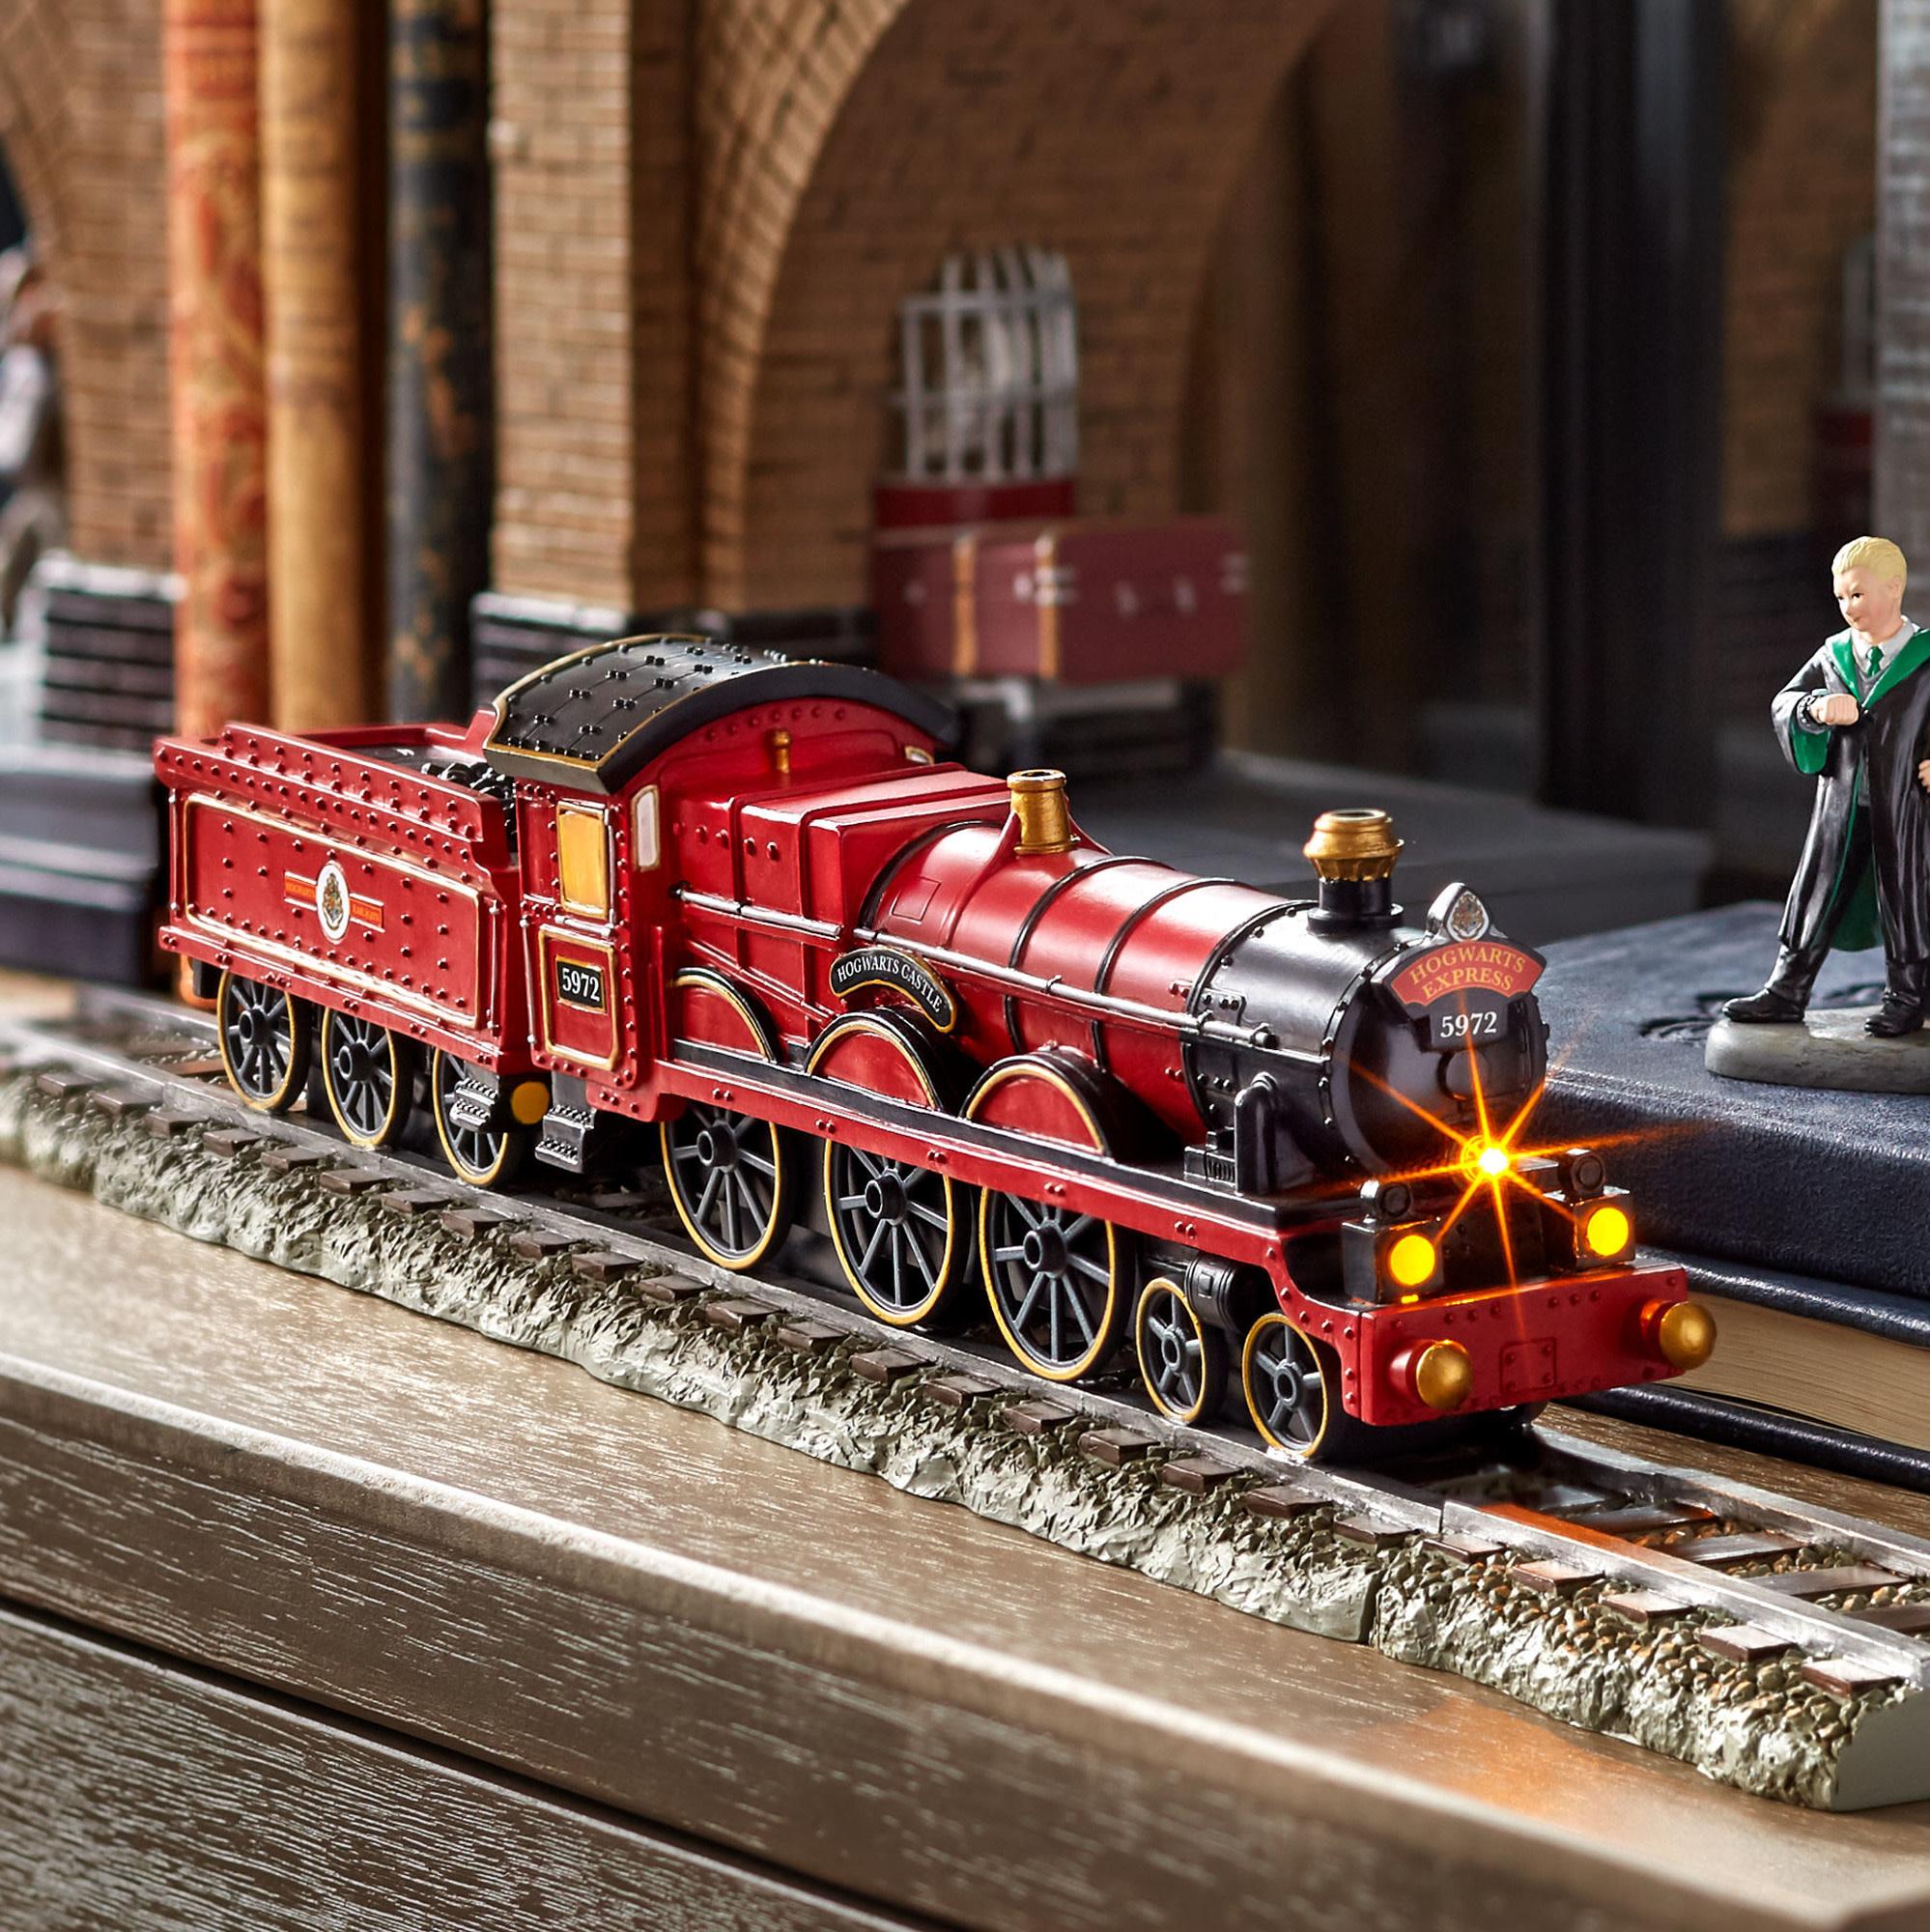 Department 56 Harry Potter Village Hogwarts Express